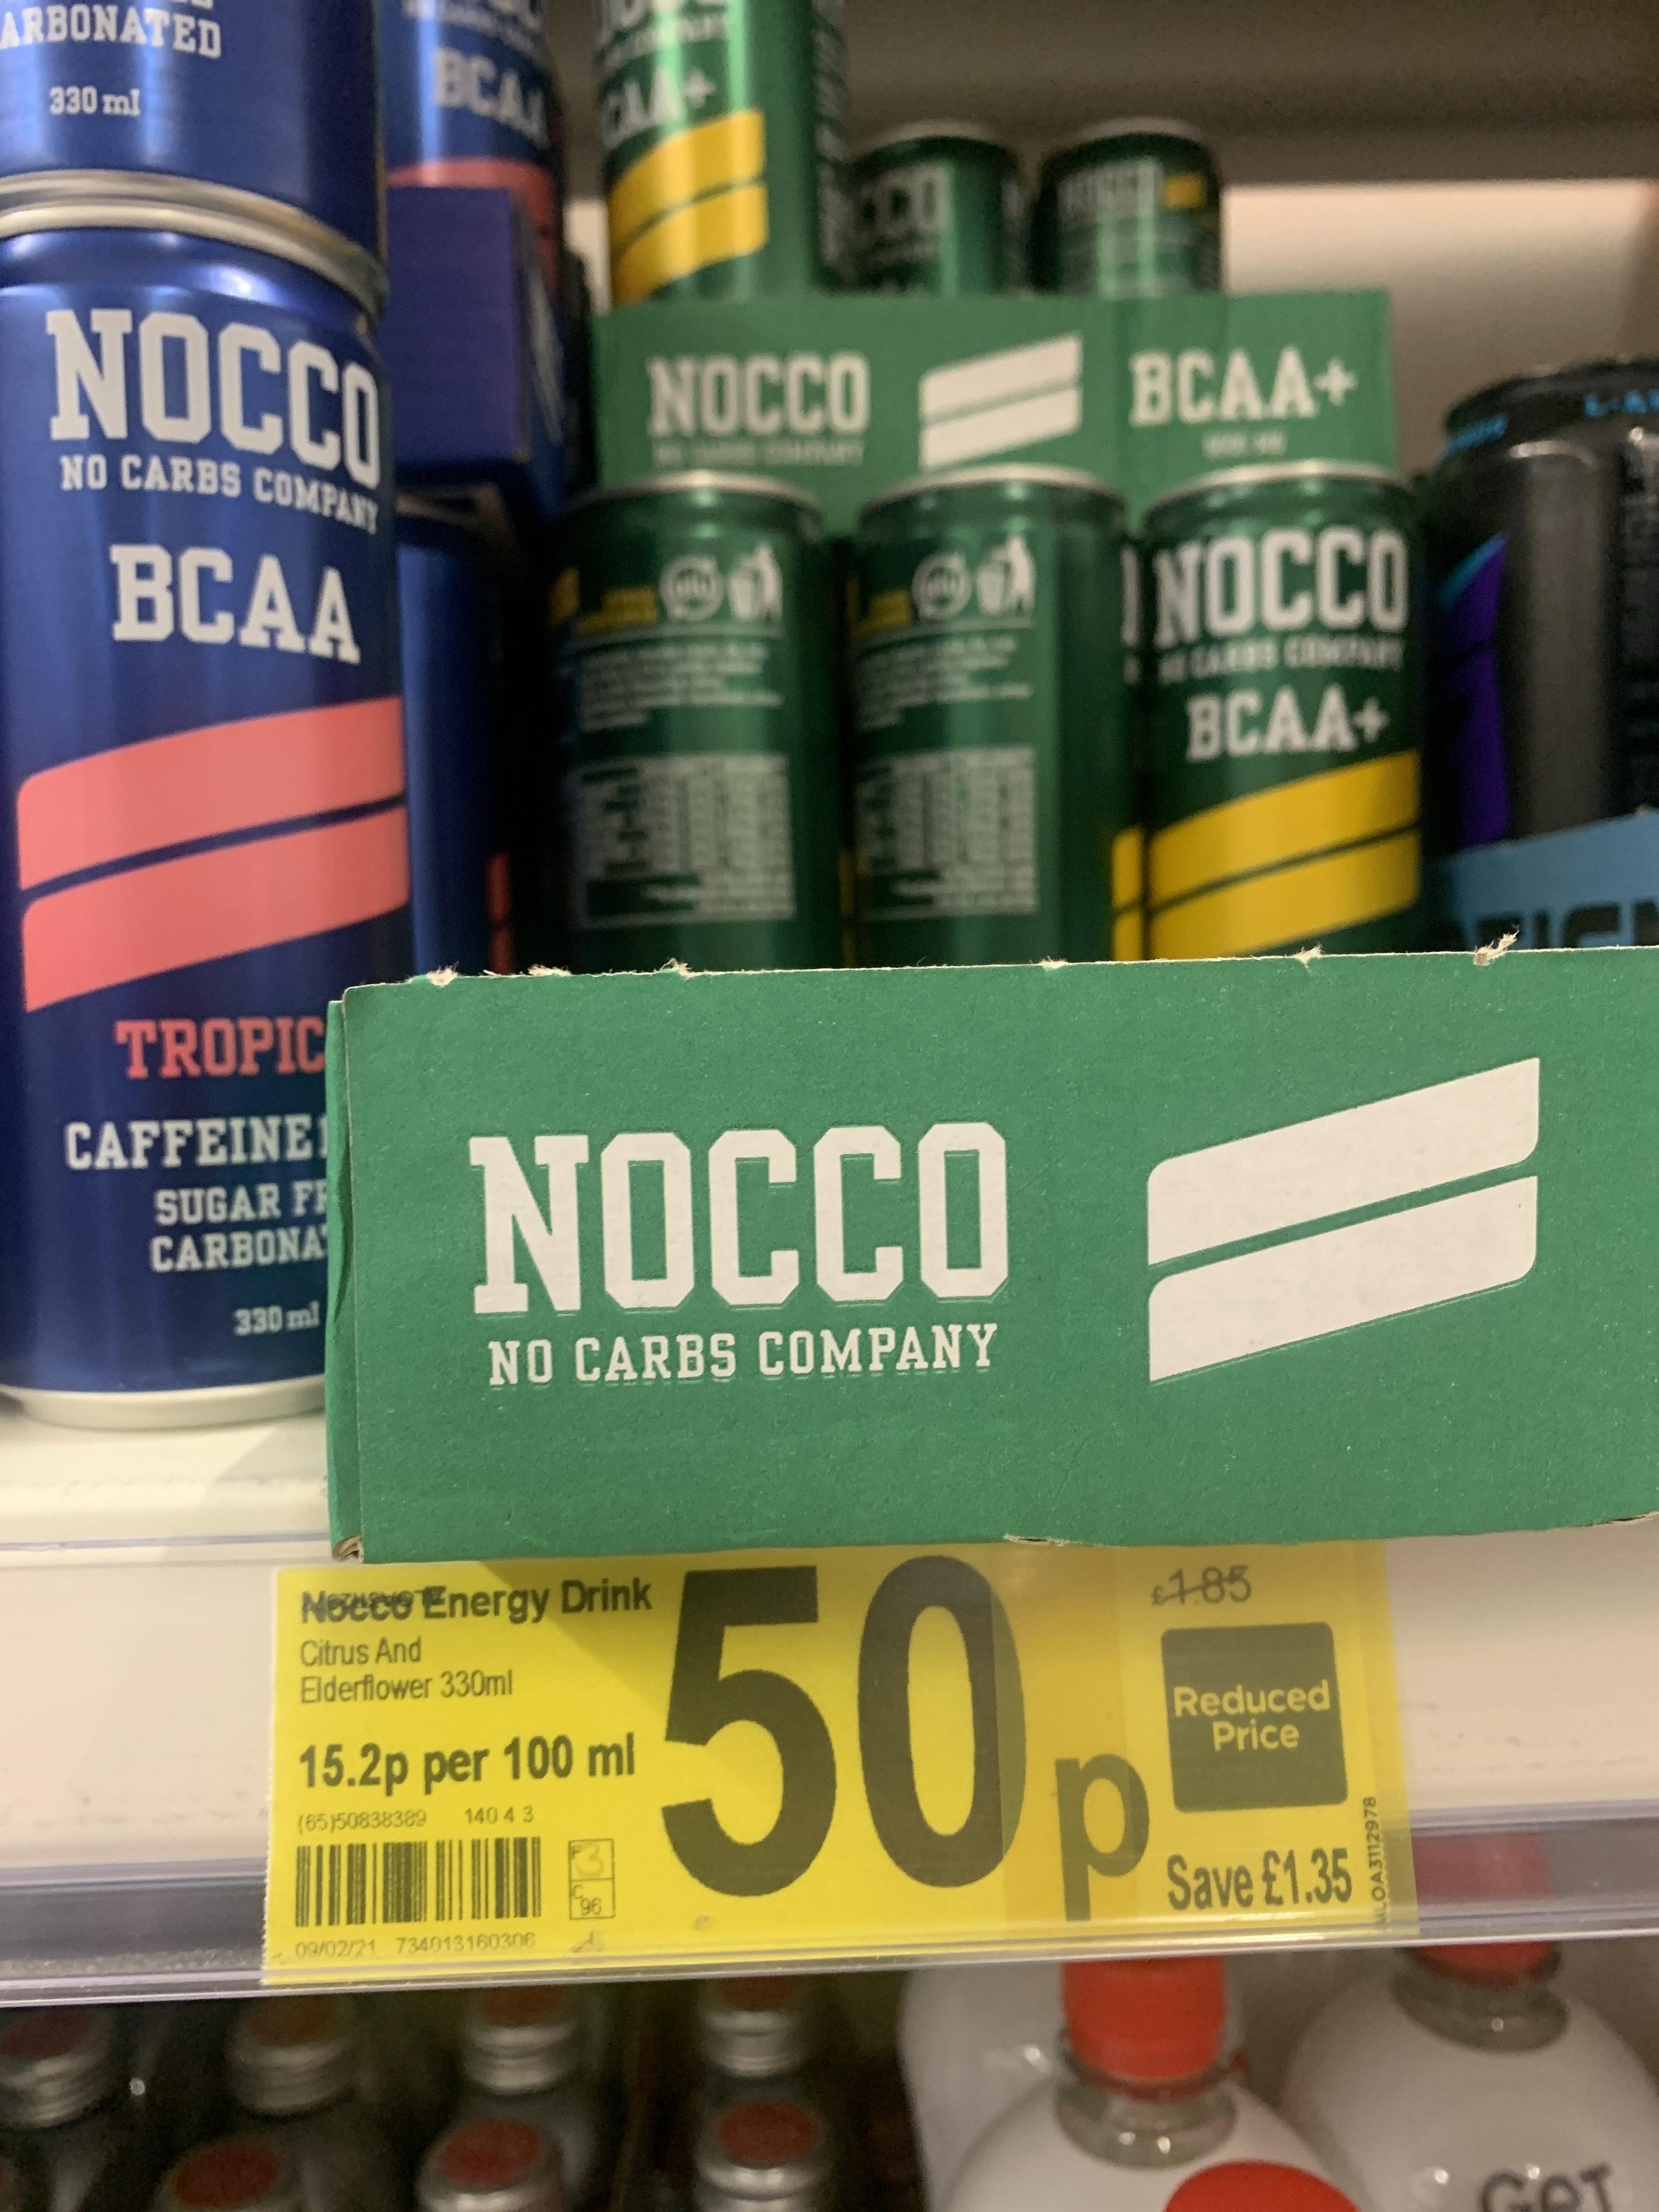 Nocco Energy Drink Citrus / elderflower 50p instore @ Asda (Burton on Trent)